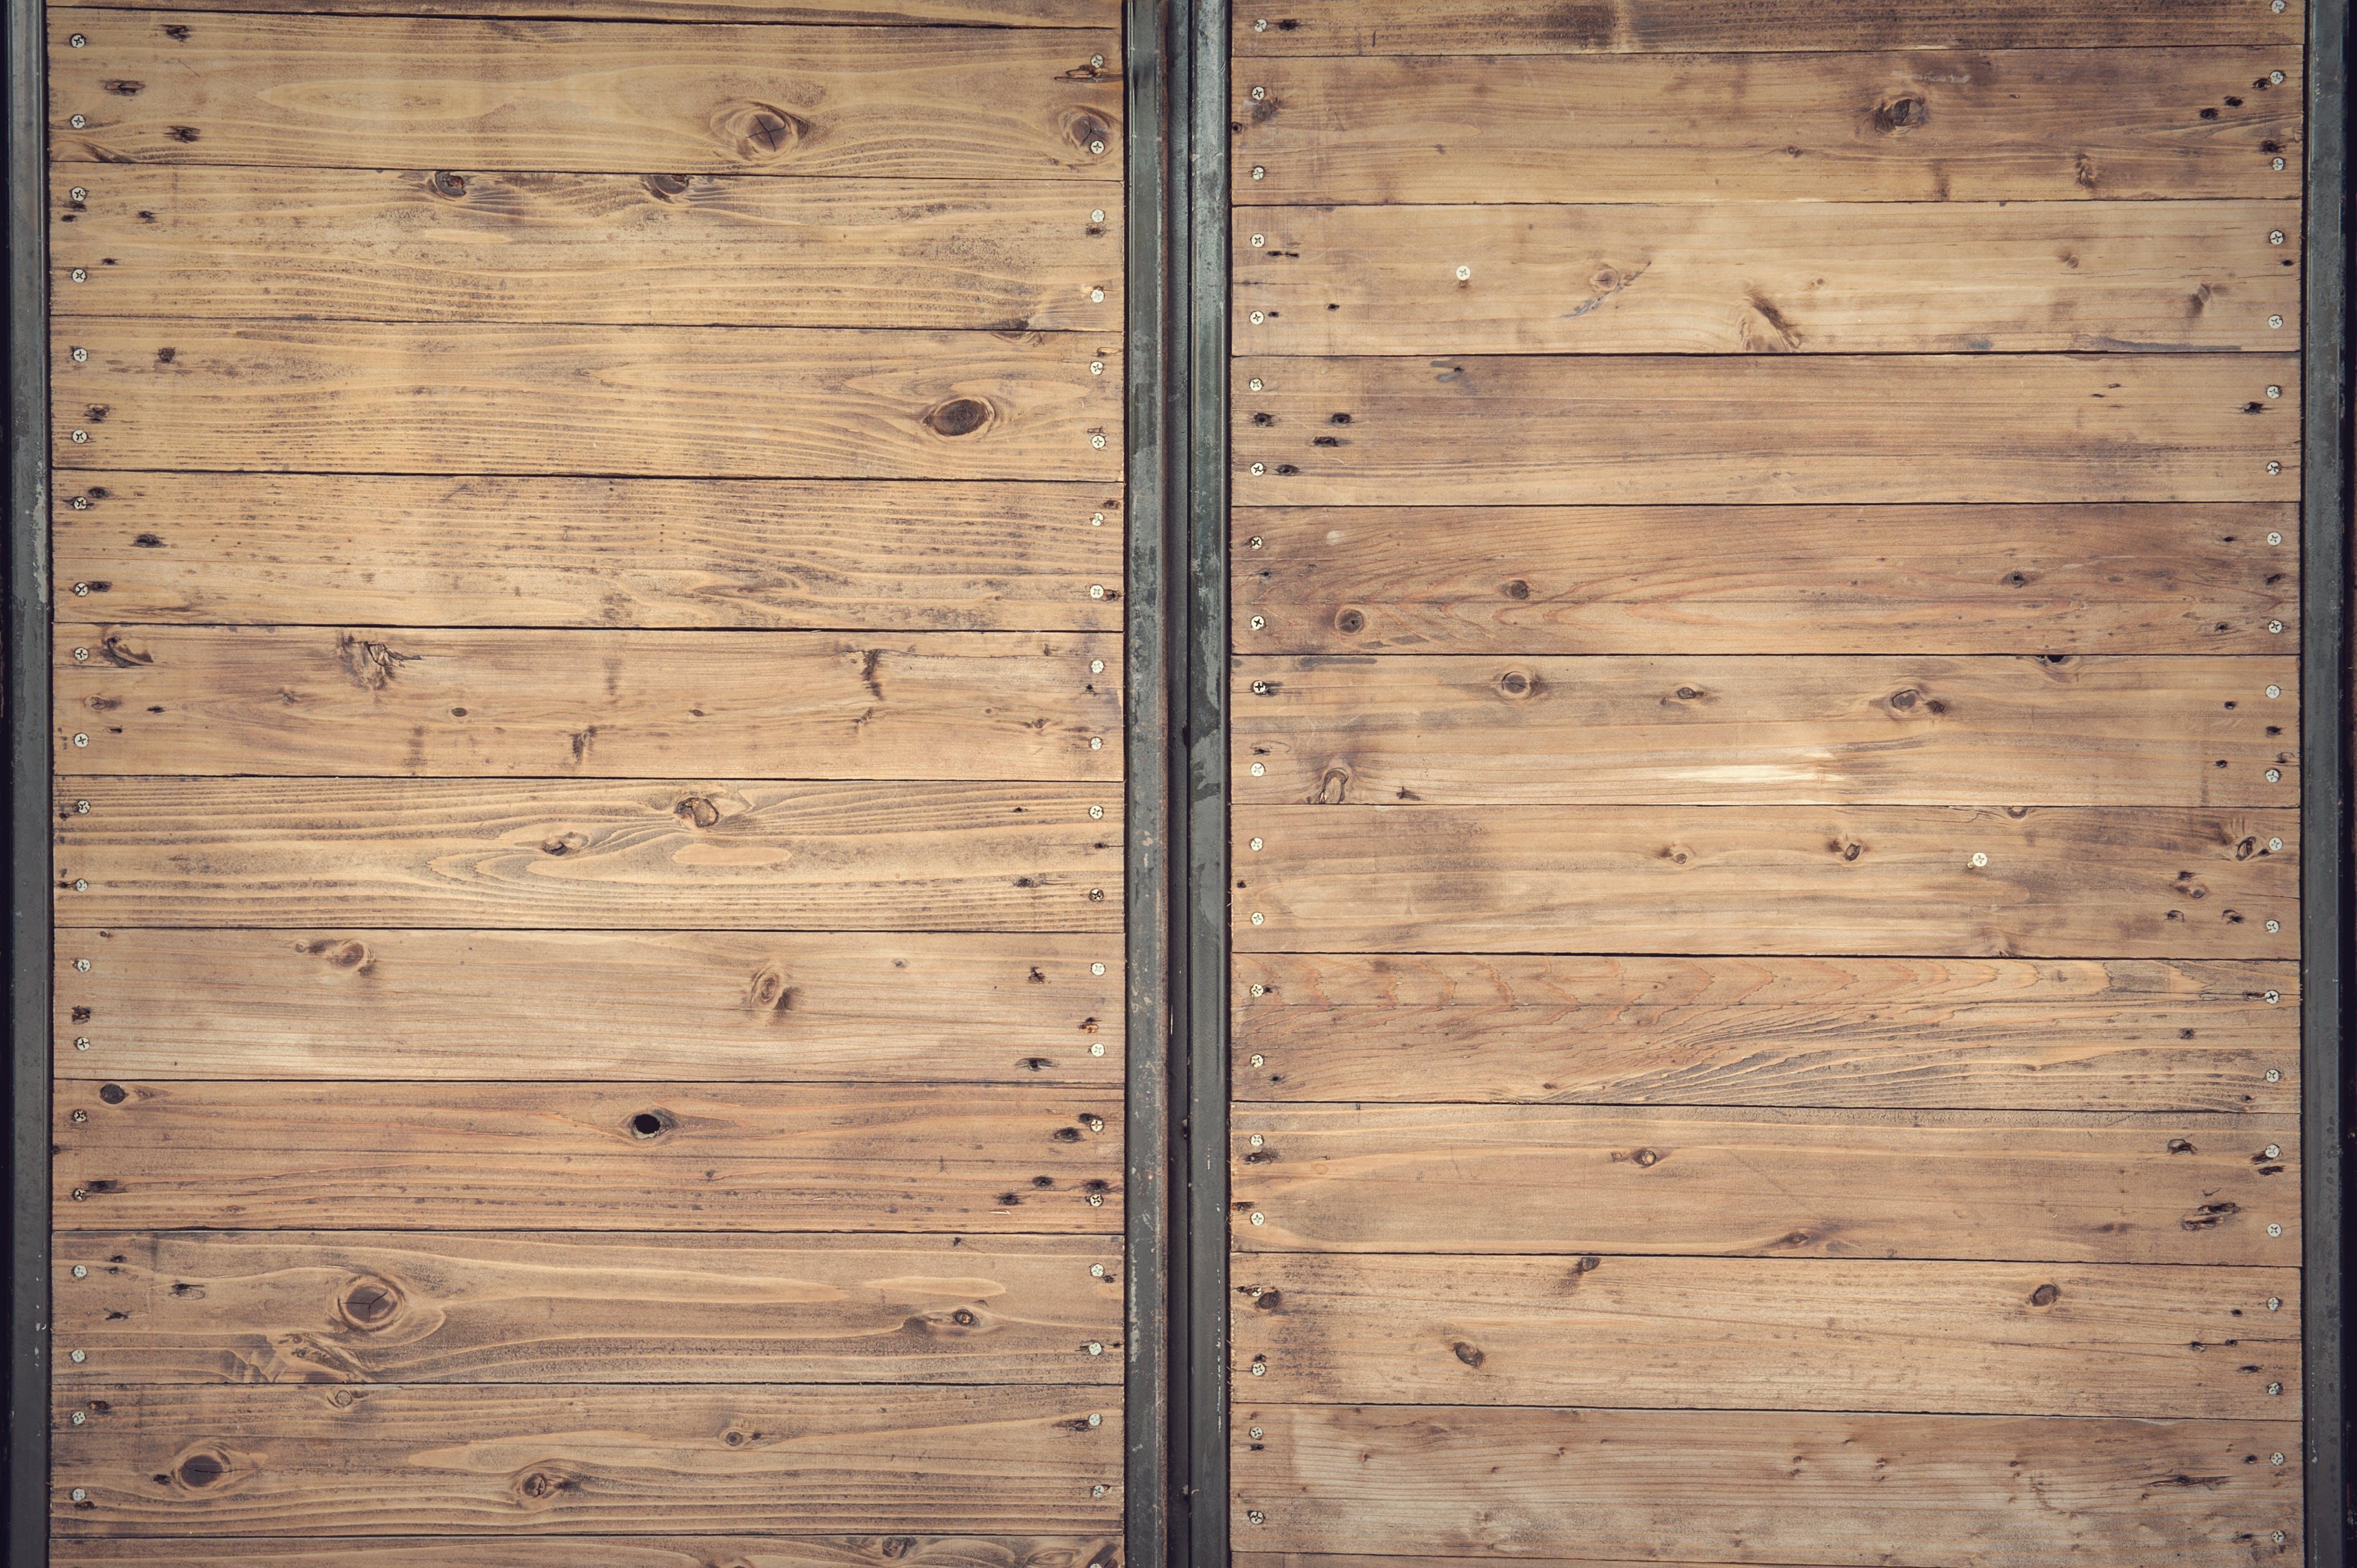 Brown Wooden Rectangular Board Beside Other Rectangular Board